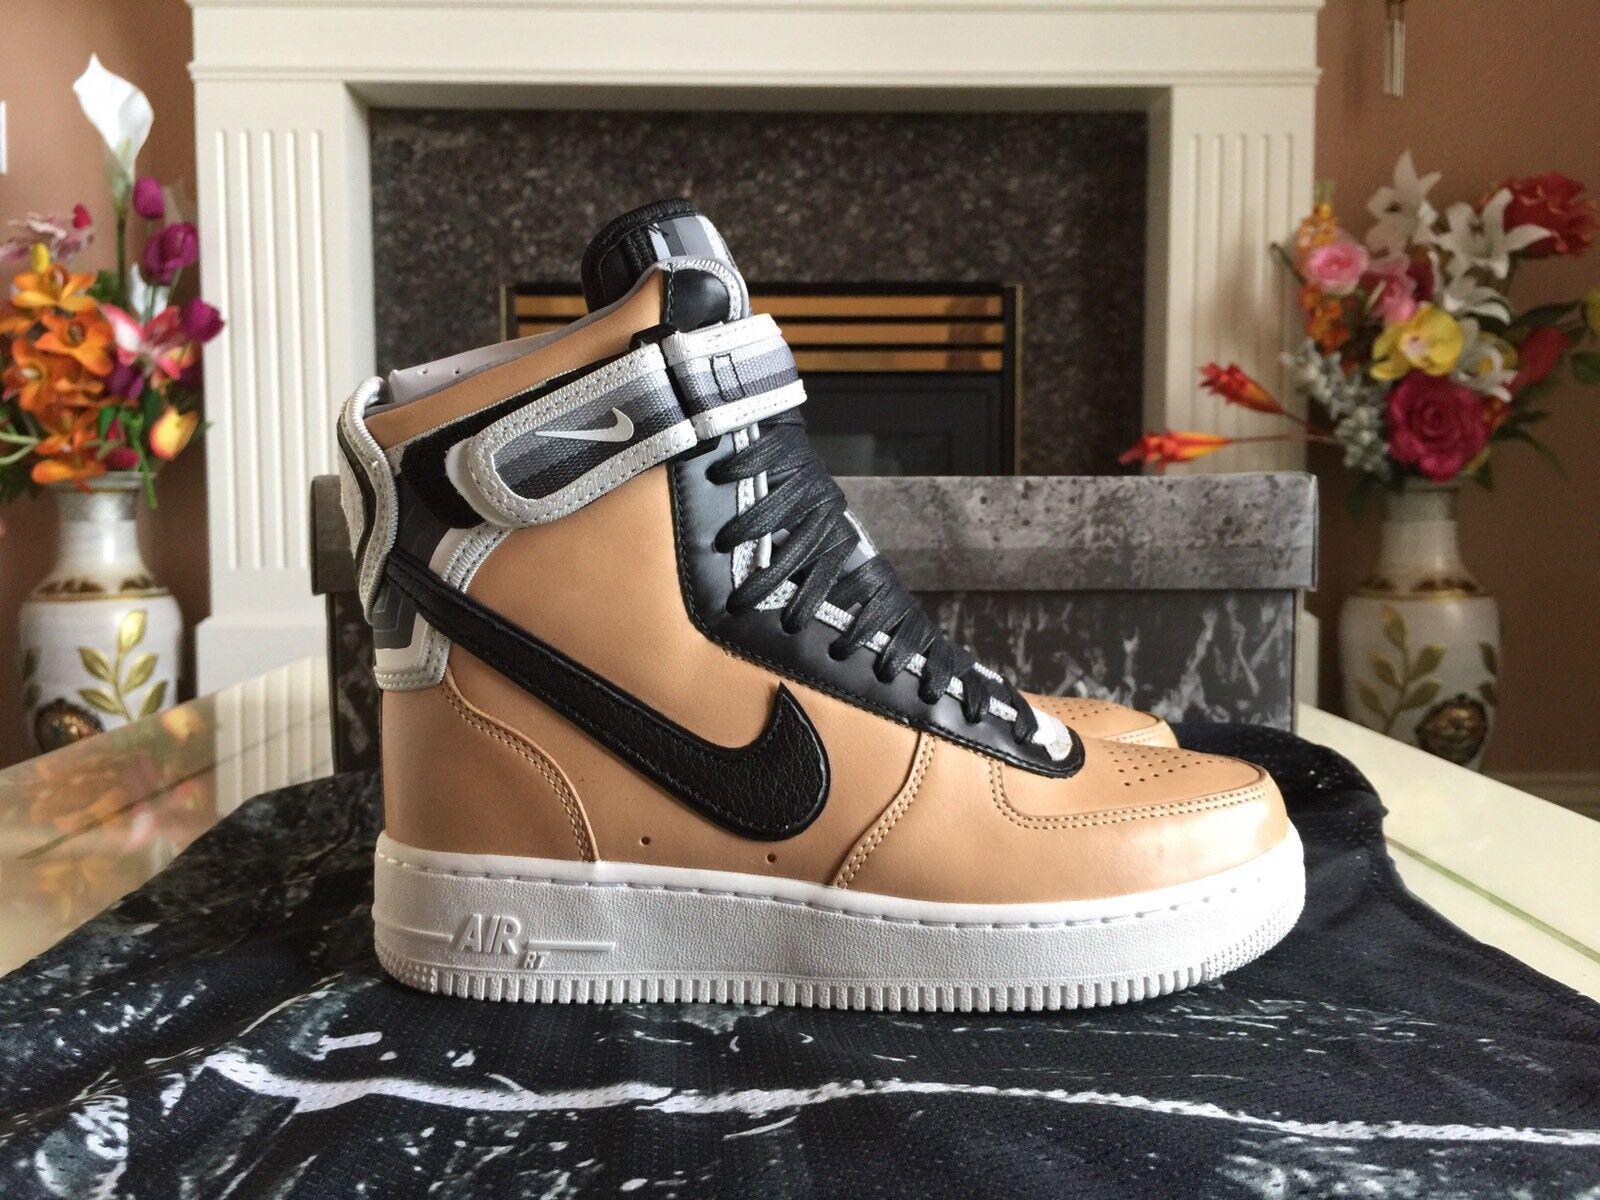 Nike Air Force 1 Hi High Tisci Riccardo Men's Comfortable best-selling model of the brand